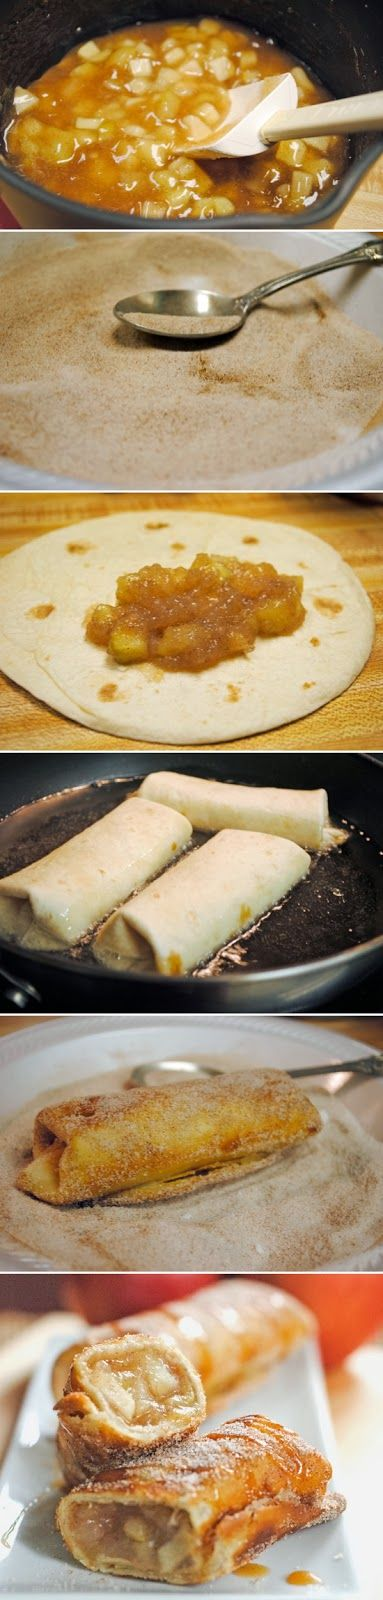 Yummy Recipes: Cinnamon Apple Dessert Chimichangas recipe